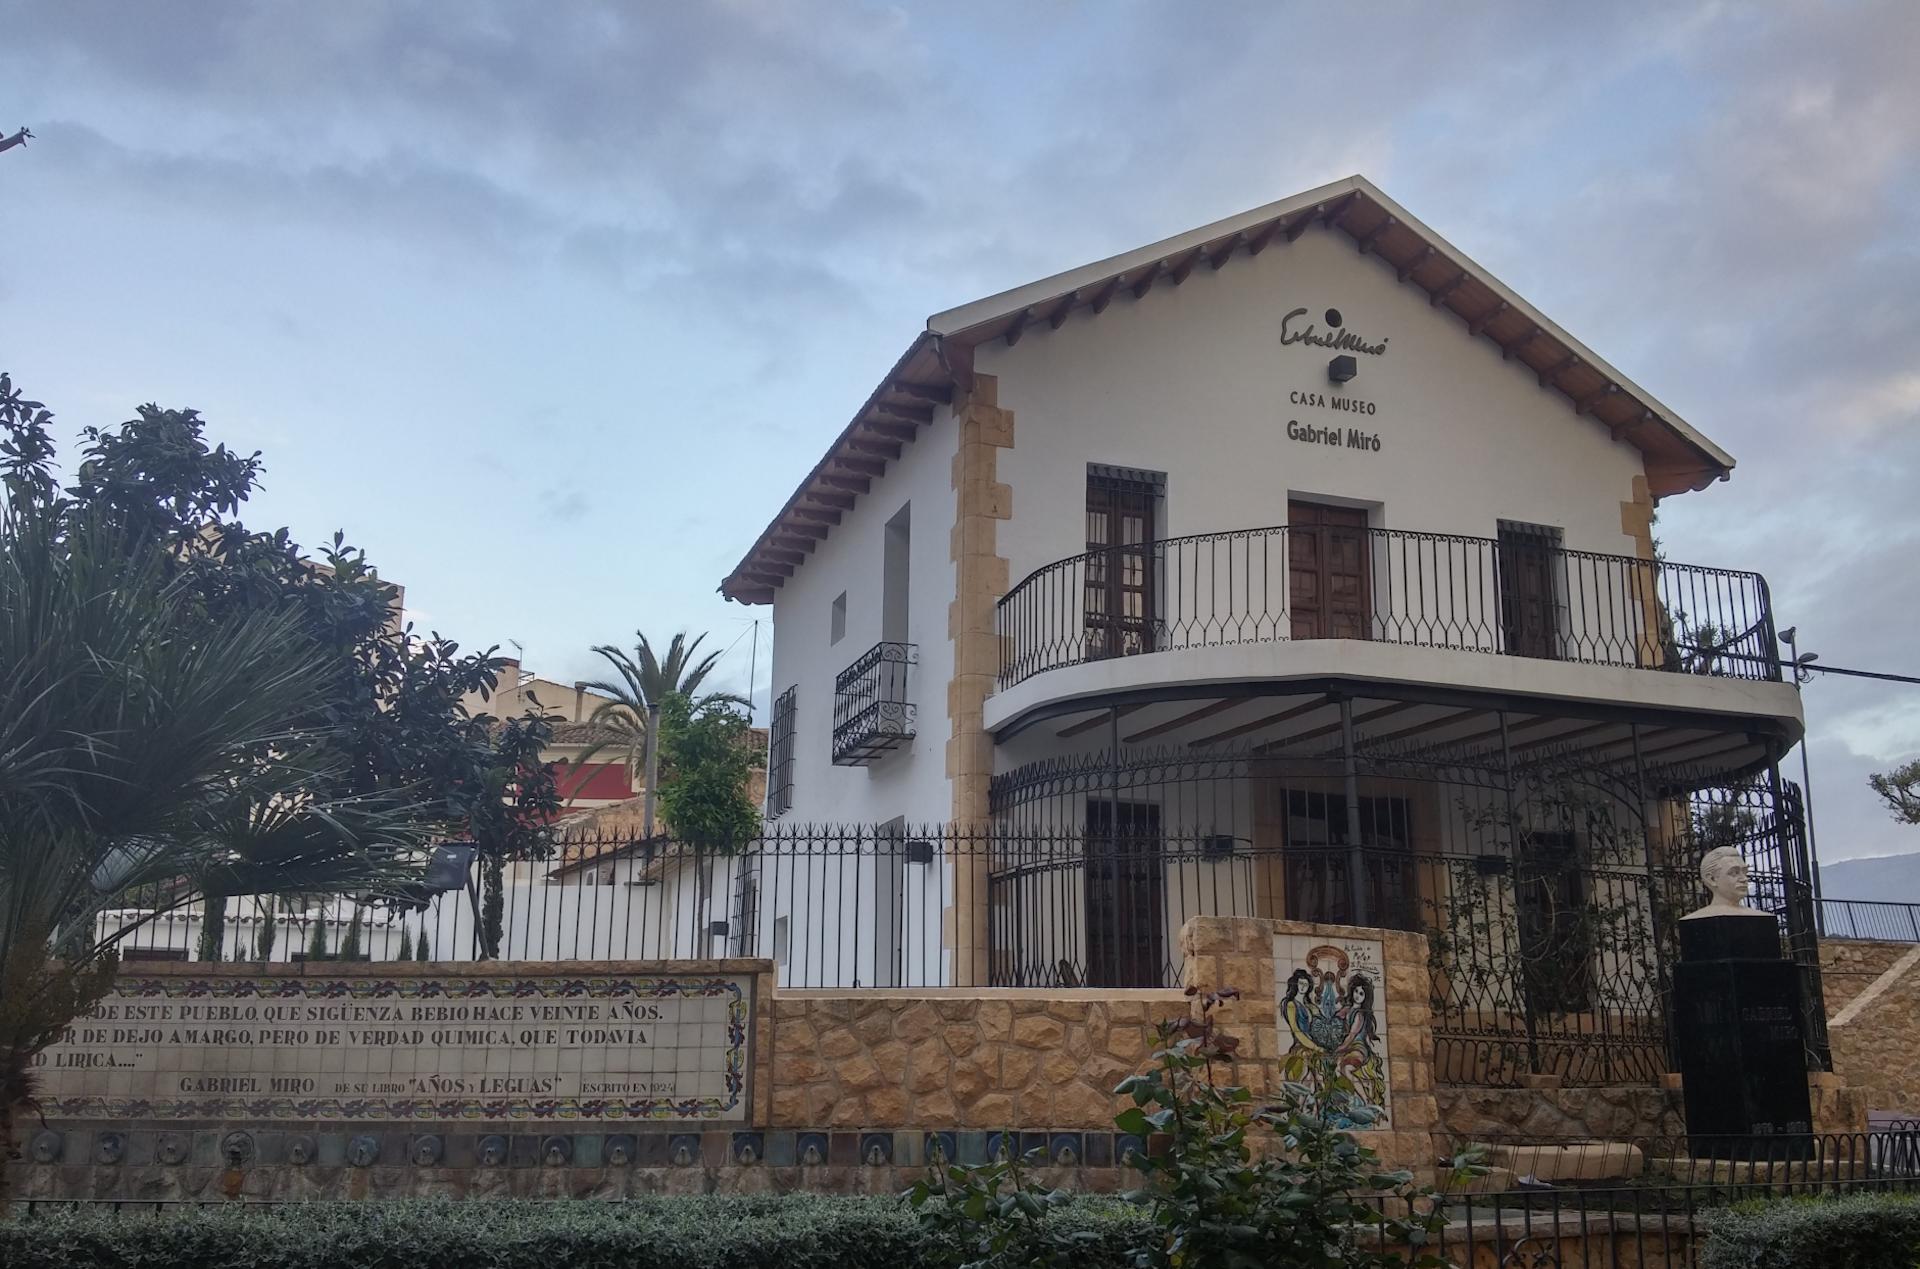 Casa-Museo Gabriel Miró